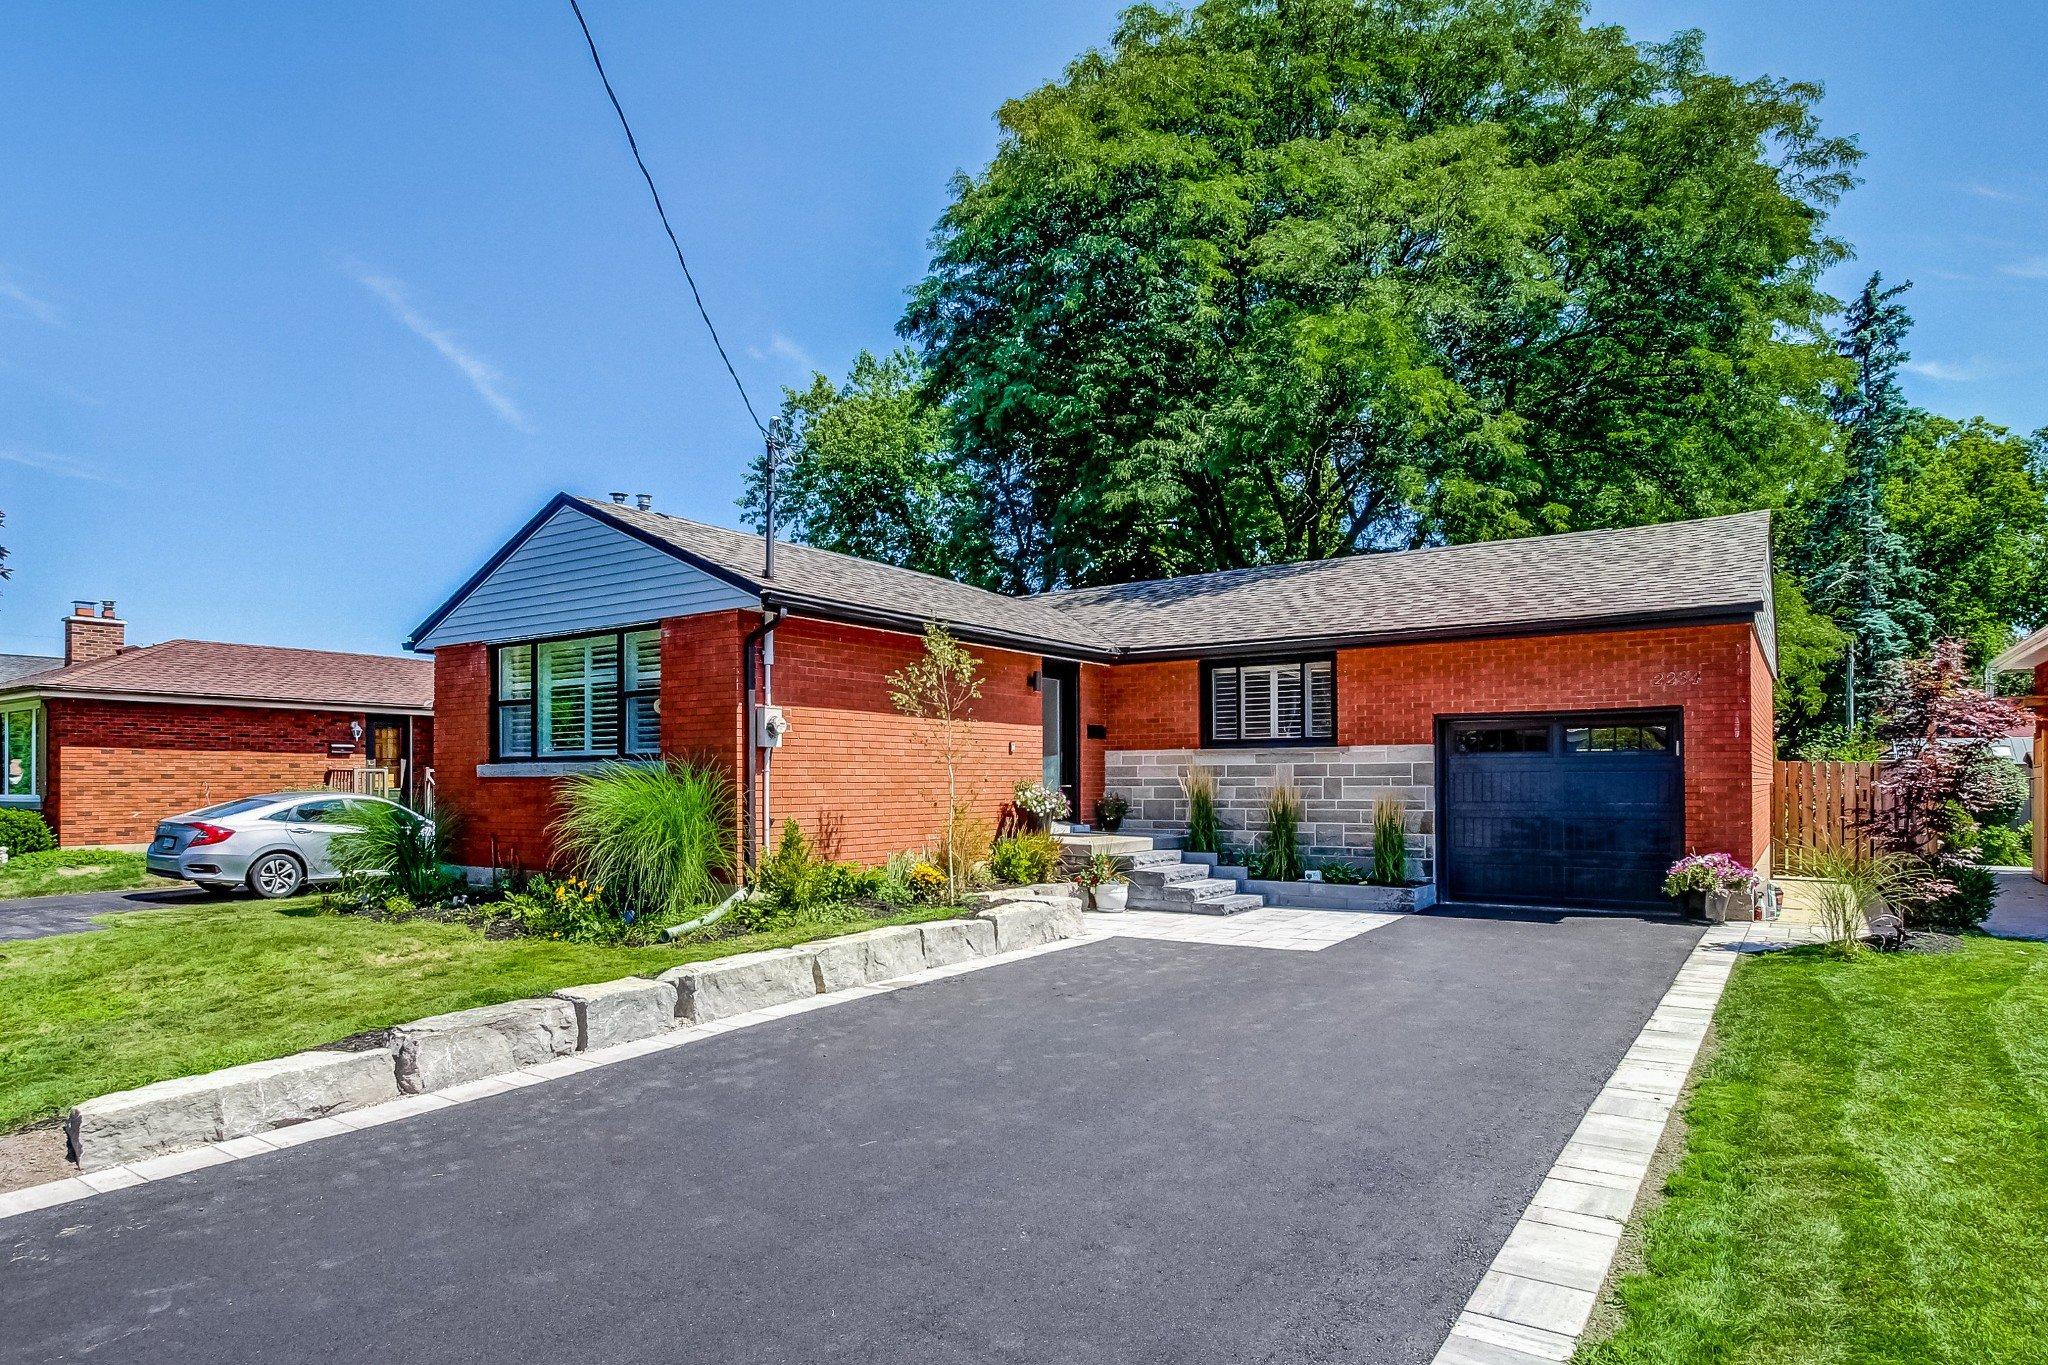 Main Photo: 2234 Joyce Street in Burlington: Brant House (Bungalow) for sale : MLS®# W4870337